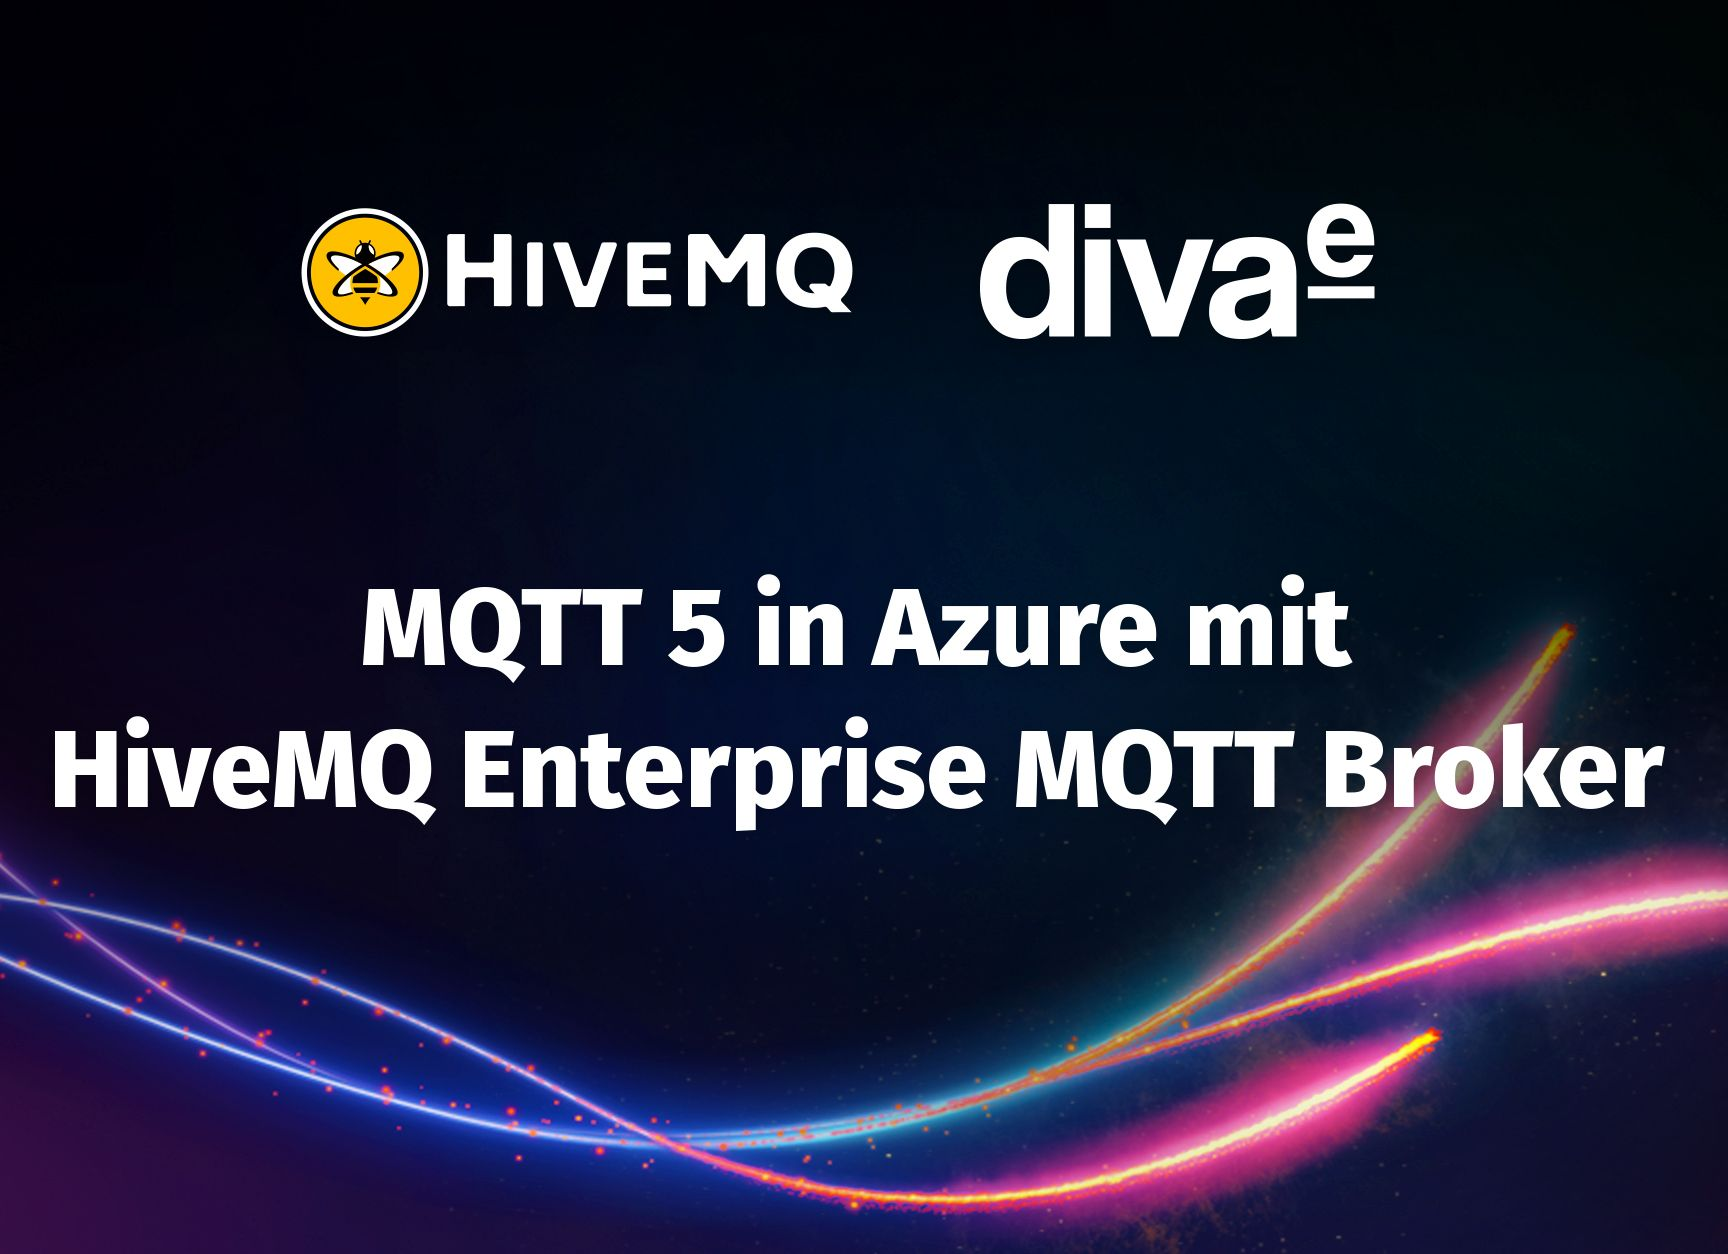 Webinar: MQTT 5 in Azure mit HiveMQ Enterprise MQTT Broker